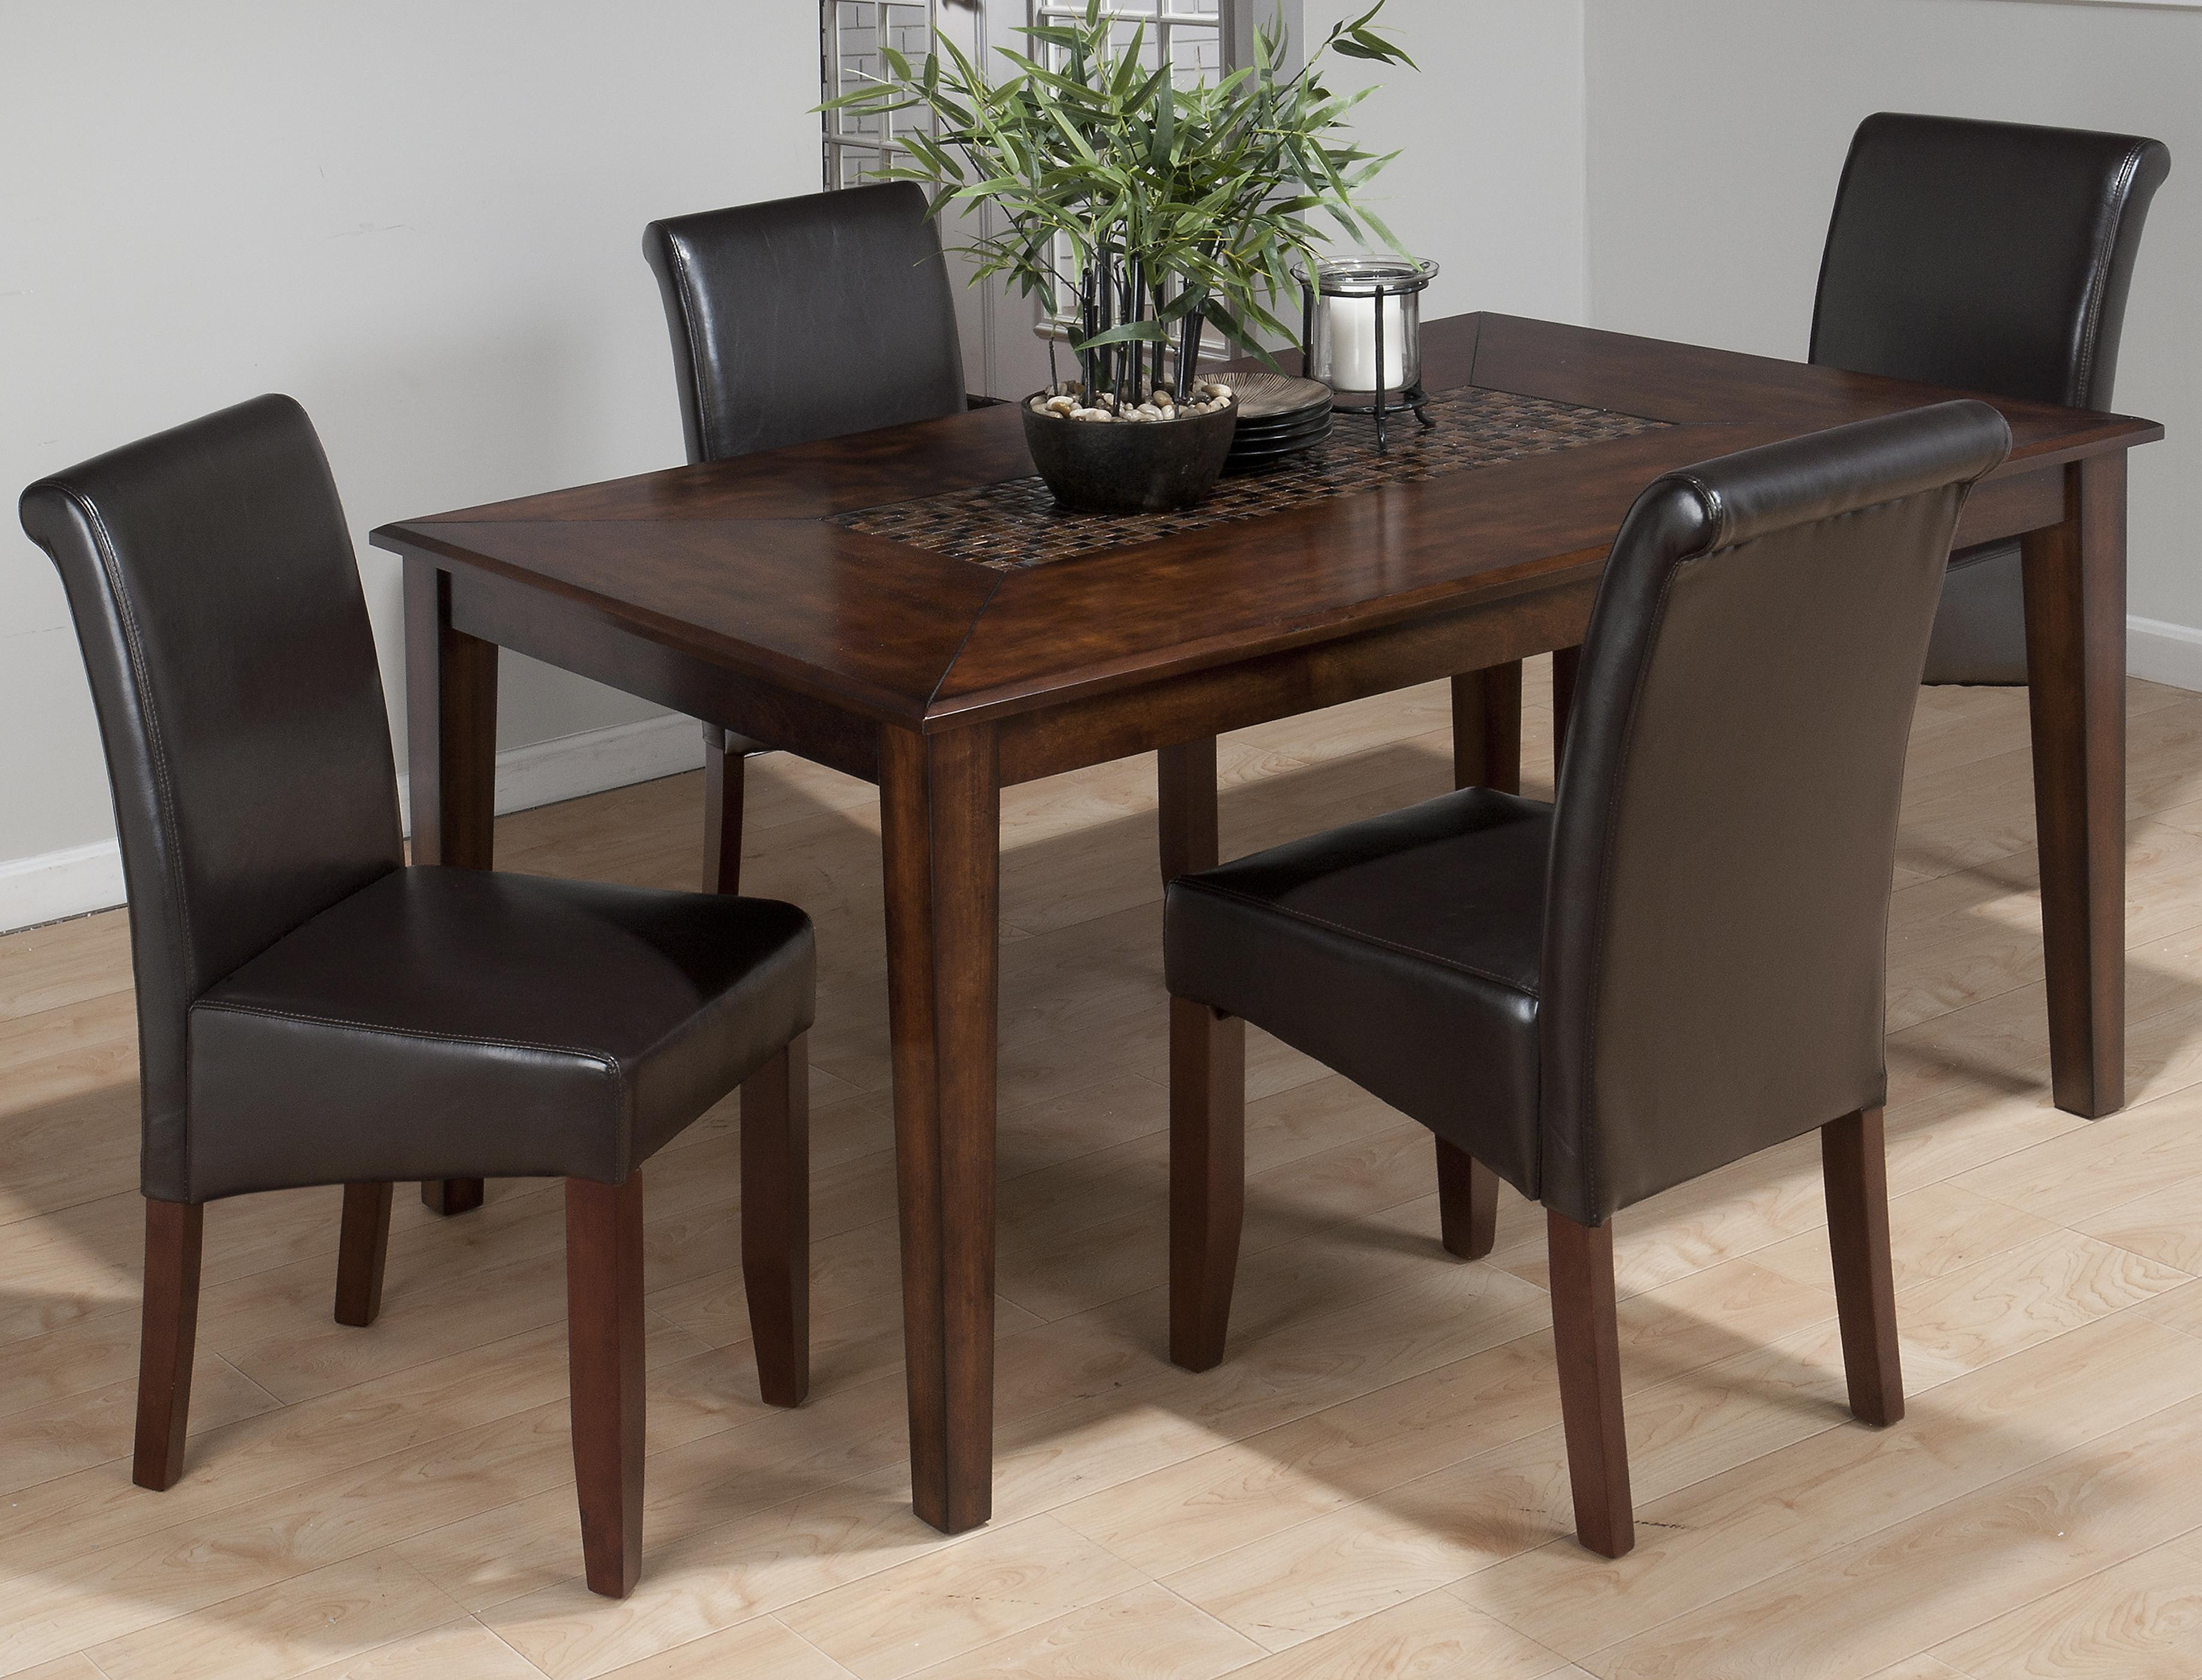 Jofran Baroque Brown 5-Piece Dining Set - Item Number: 697-64+4x888-480KD